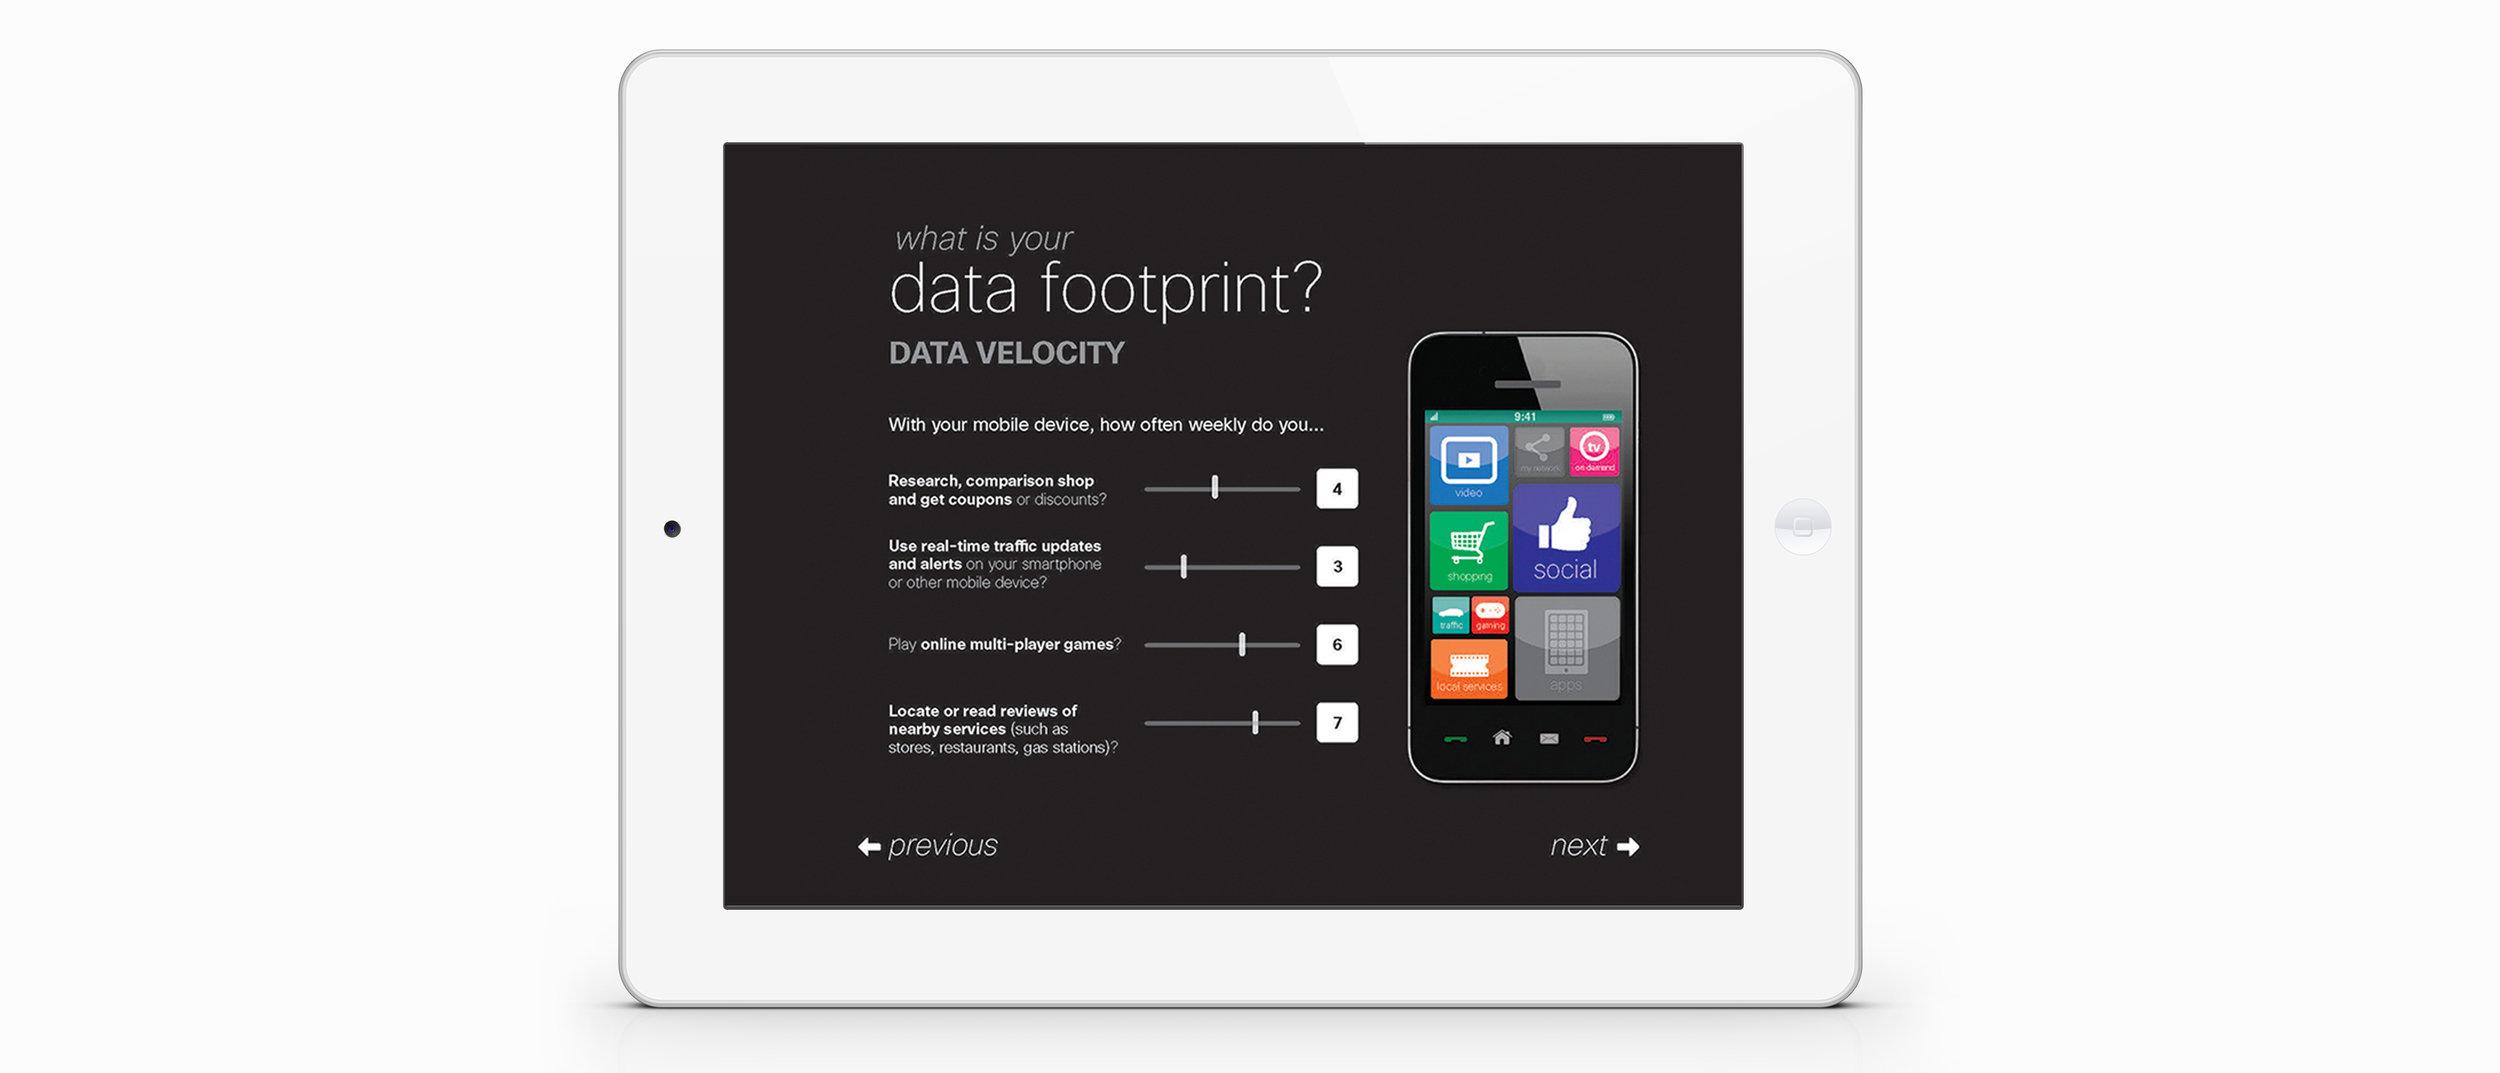 Footprint_iPad_4 copy.jpg